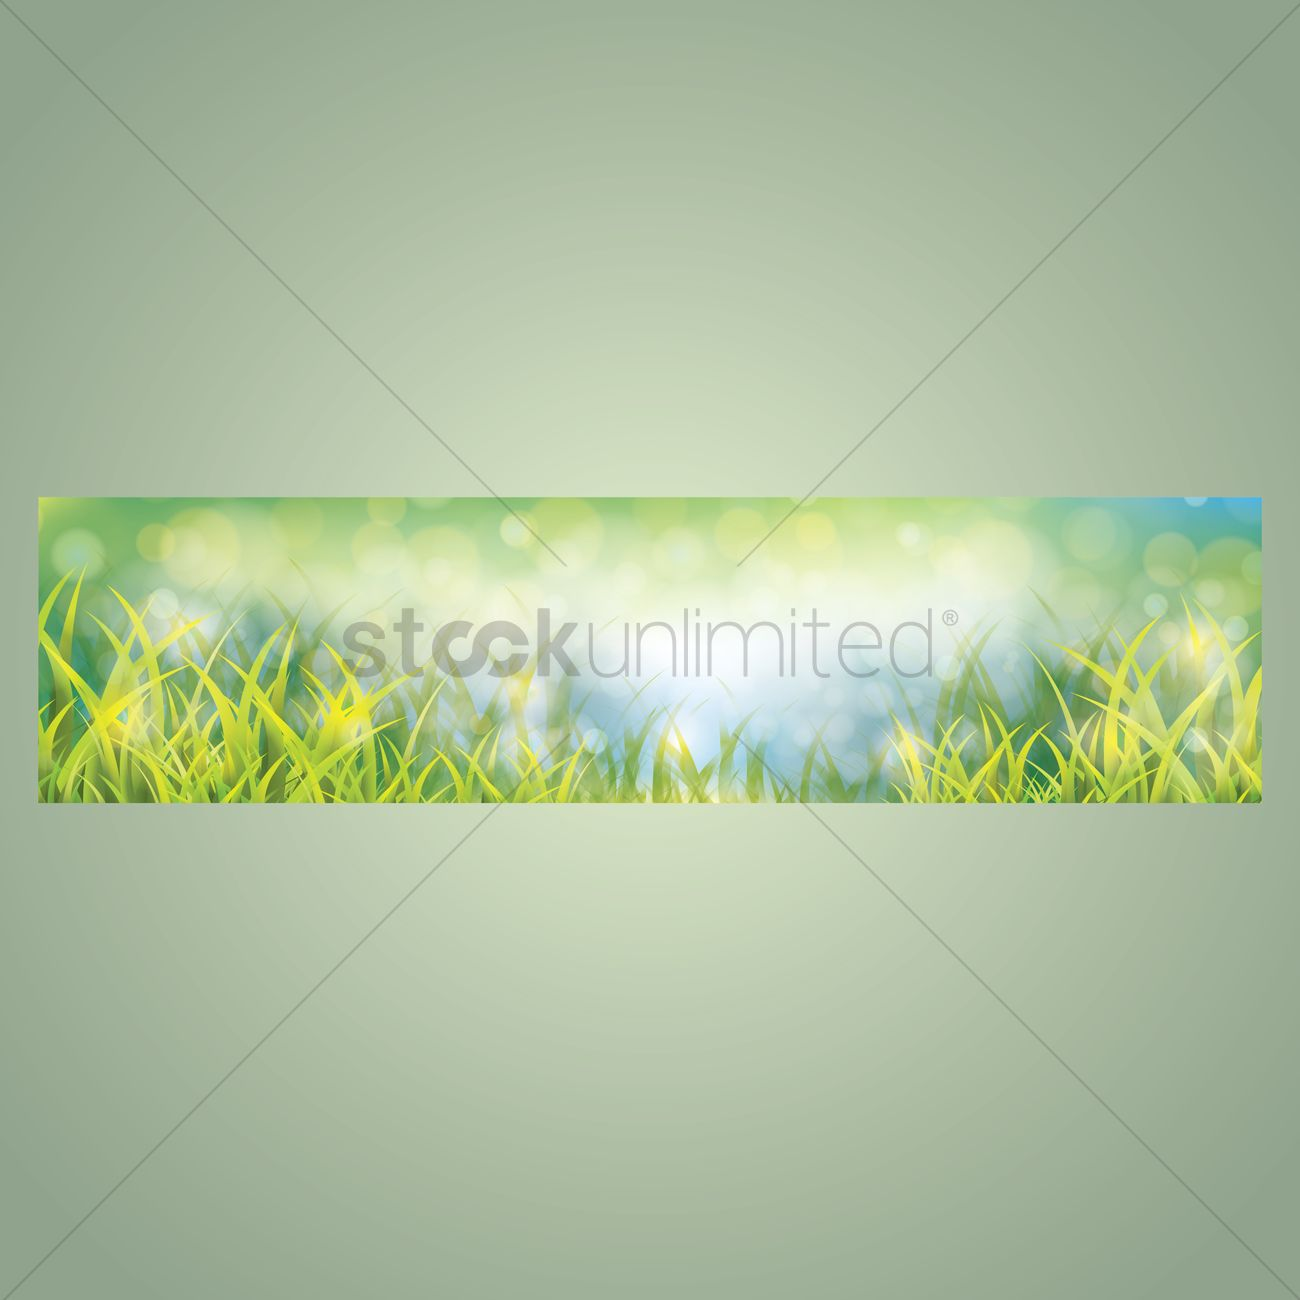 nature banner design vector image 1612320 stockunlimited